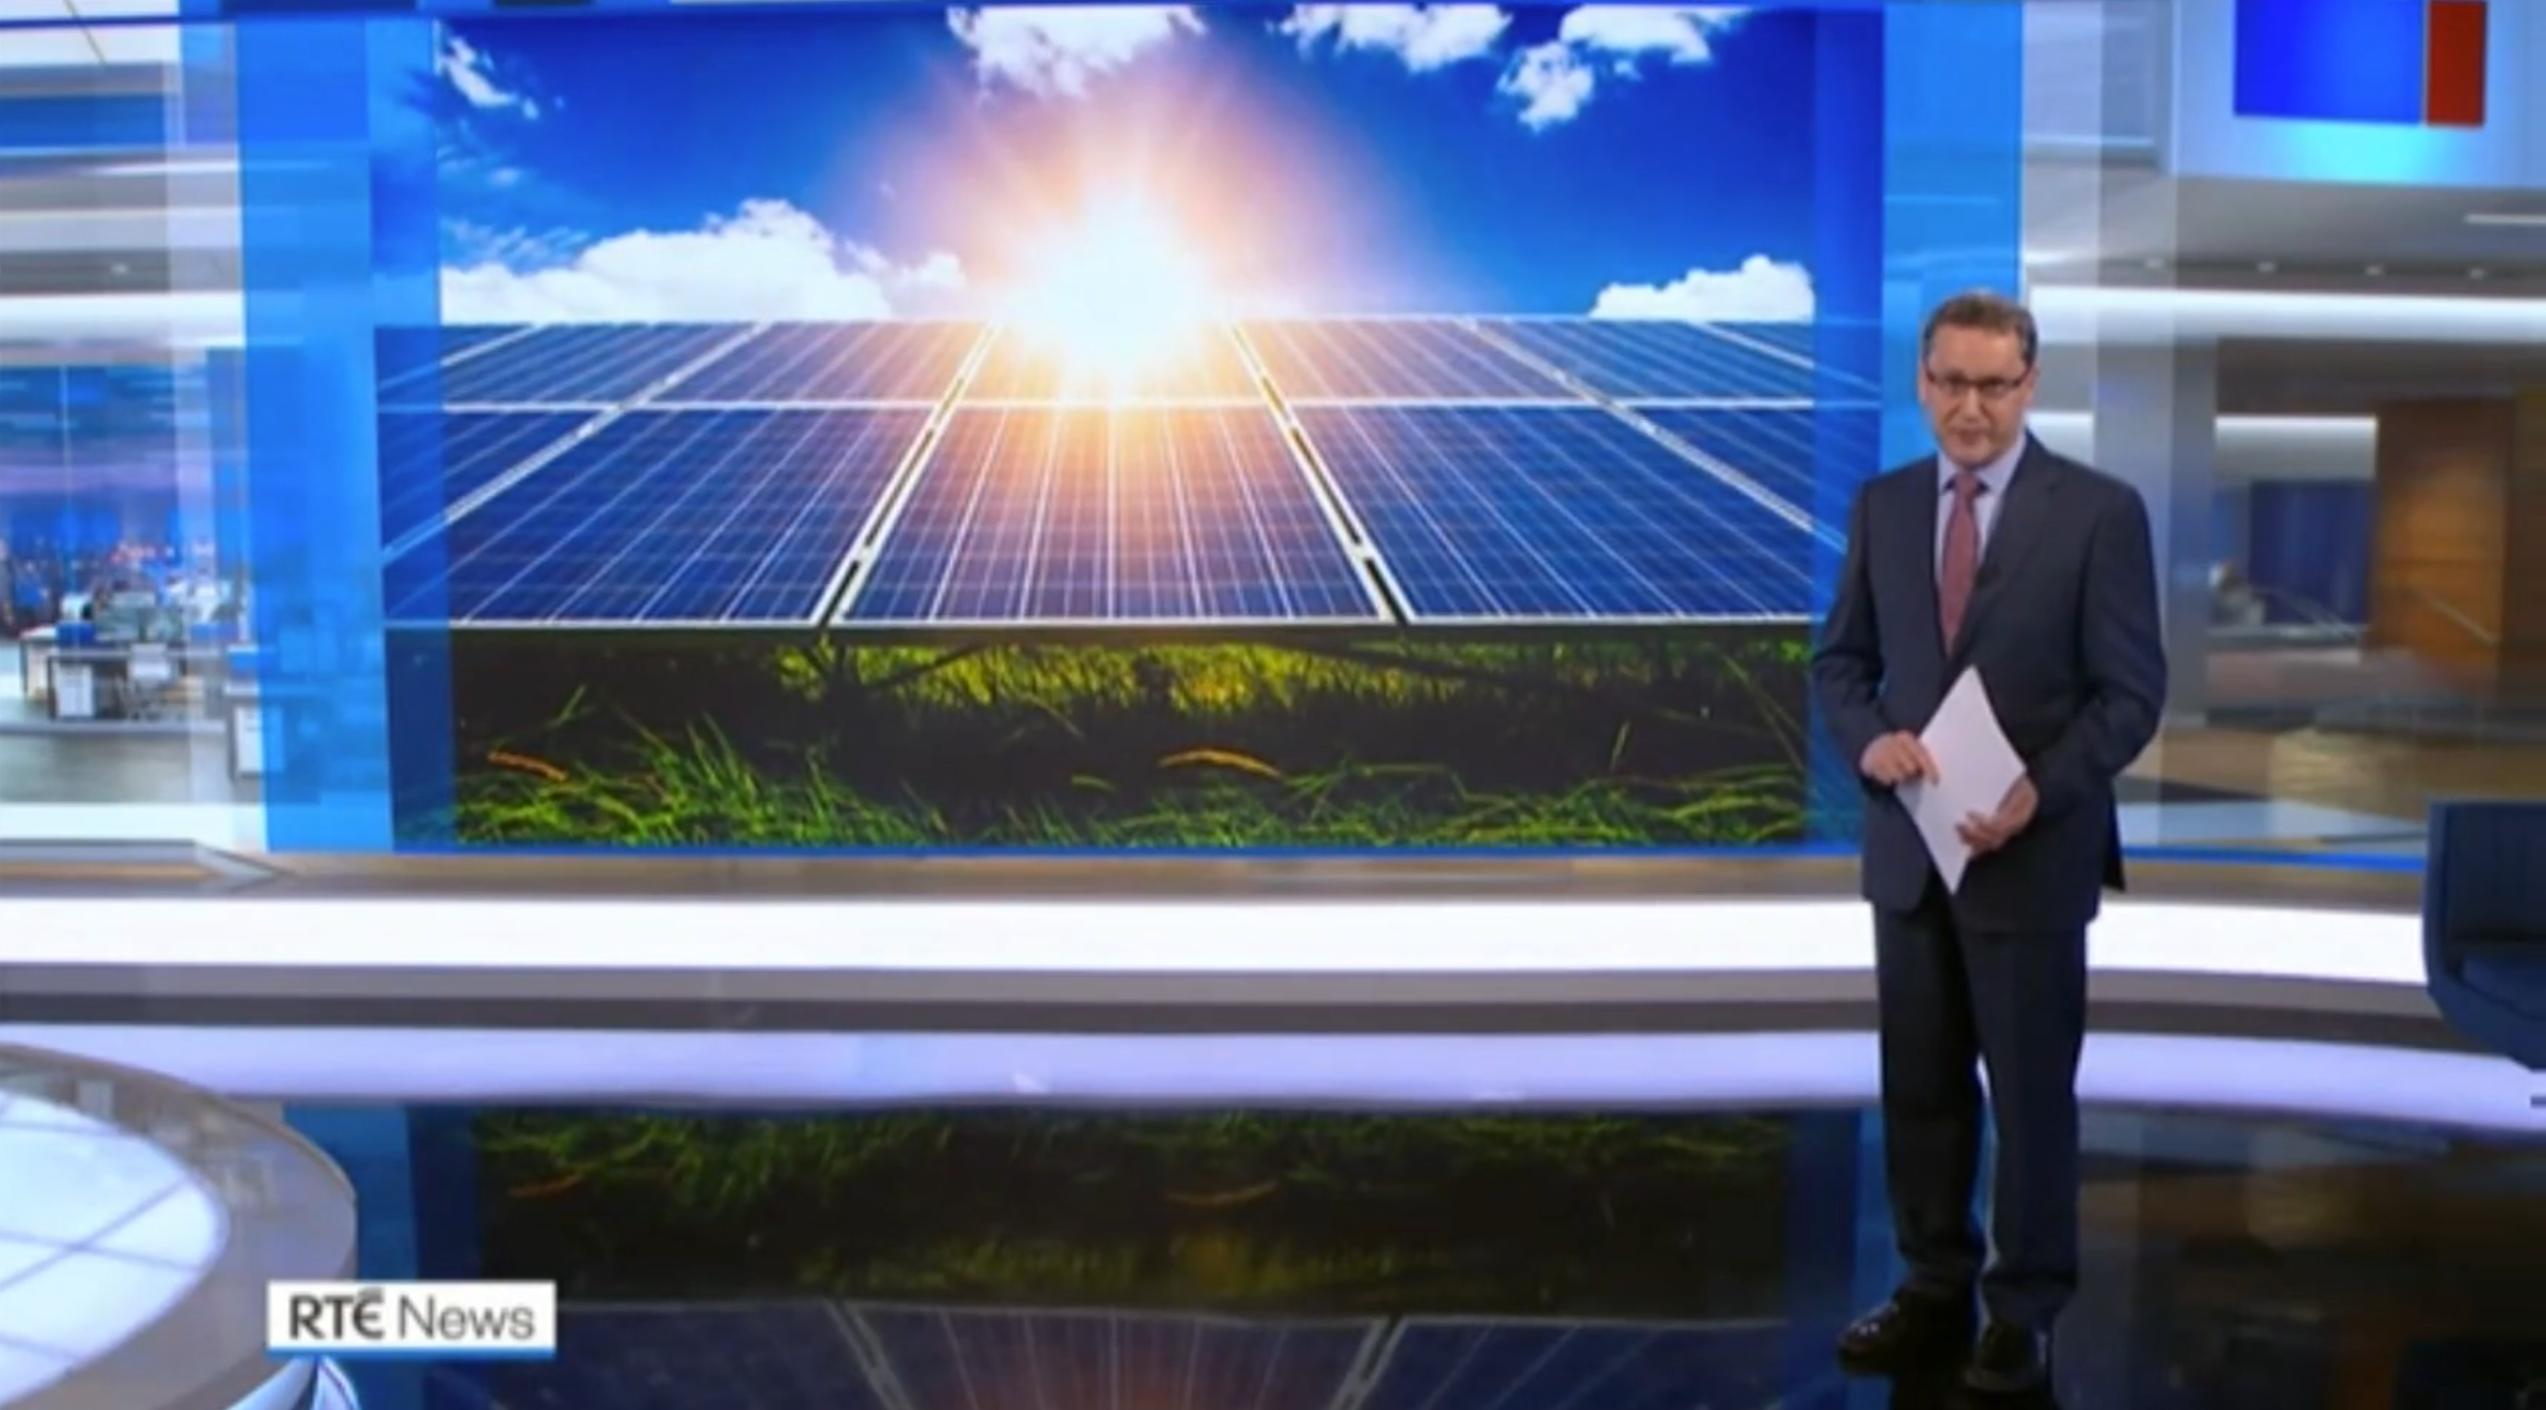 RTE news presenting solar energy